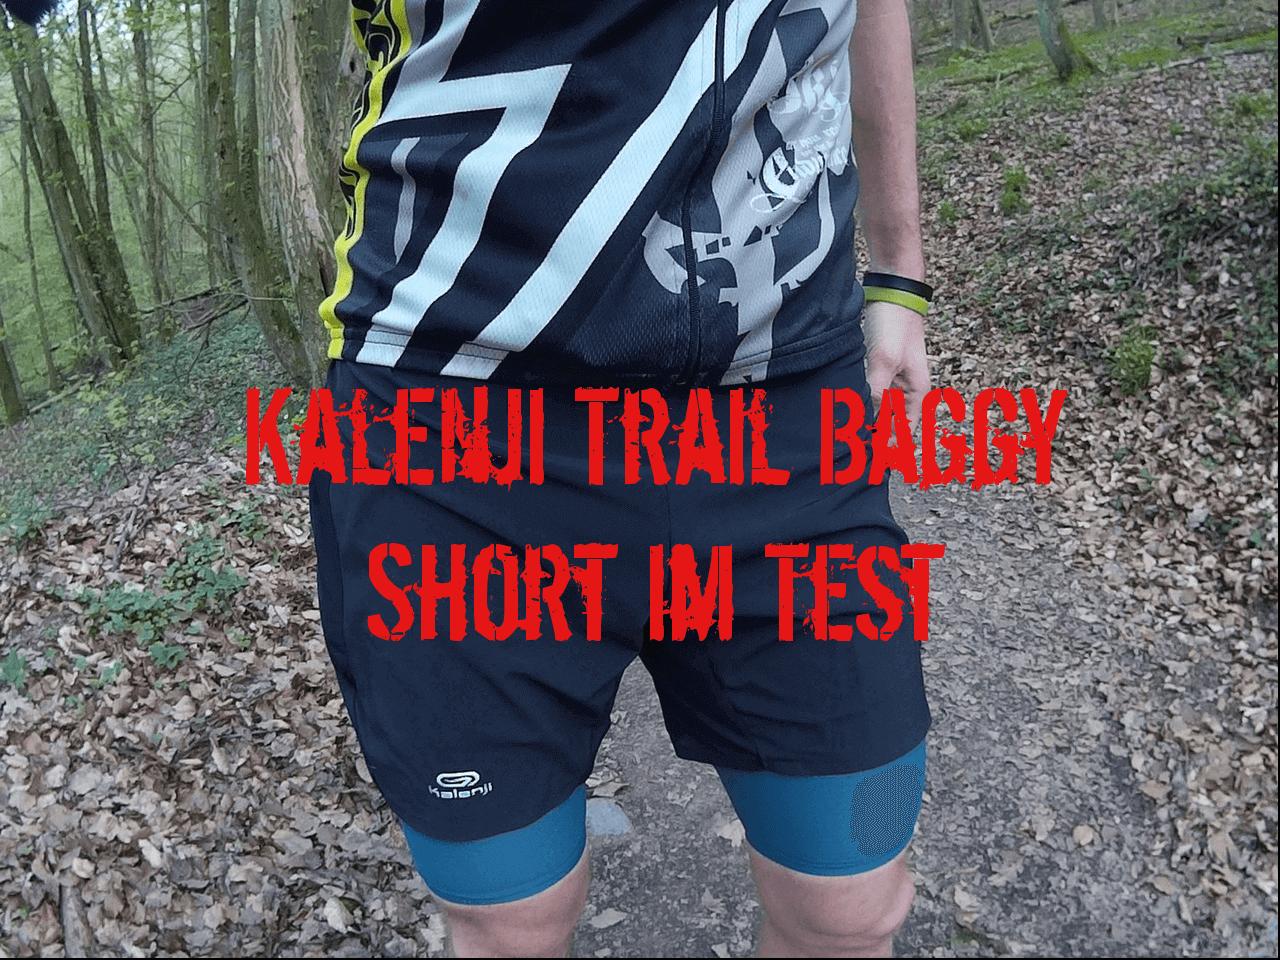 Kalenji-Trail-Baggy-Beitragsbild